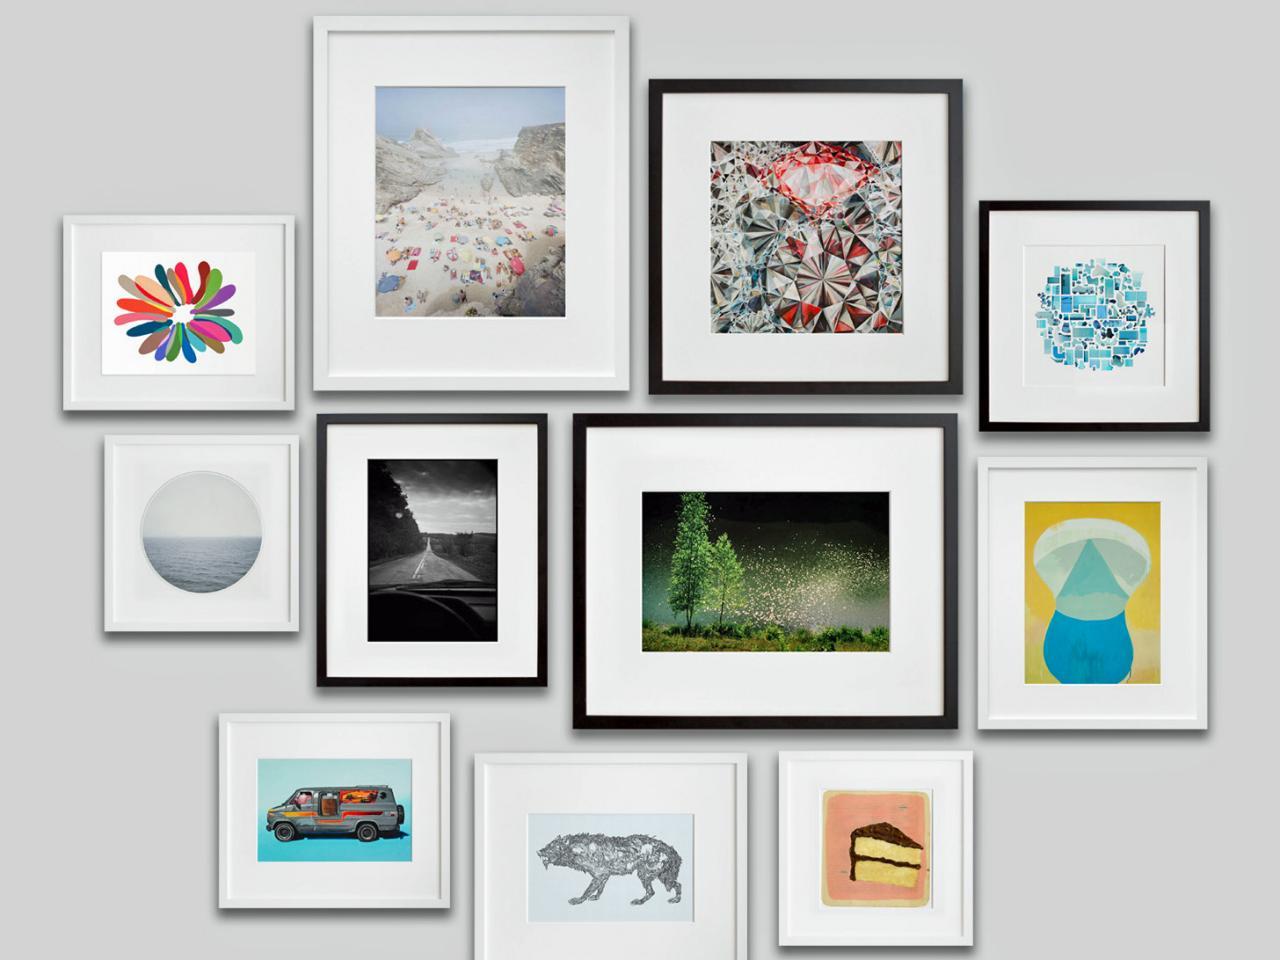 Color of art gallery walls - Black And White Color Frame 18 Desktop Background